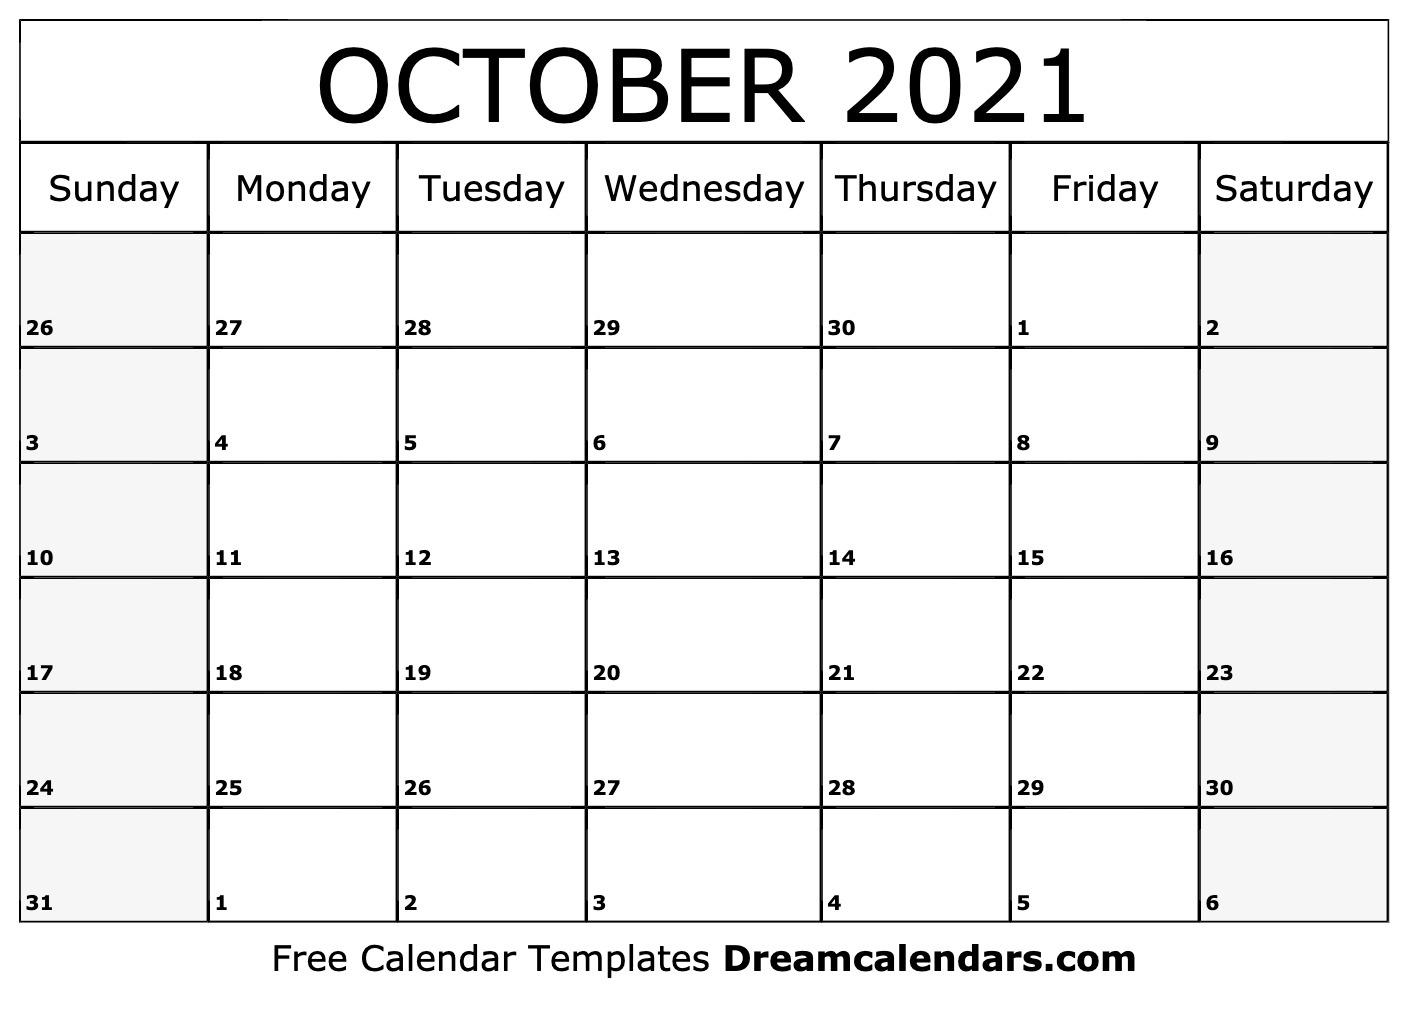 2021 Printable Calendar From October Thru December   Calendar Printables Free Blank Printable Calendar October 2020 To September 2021